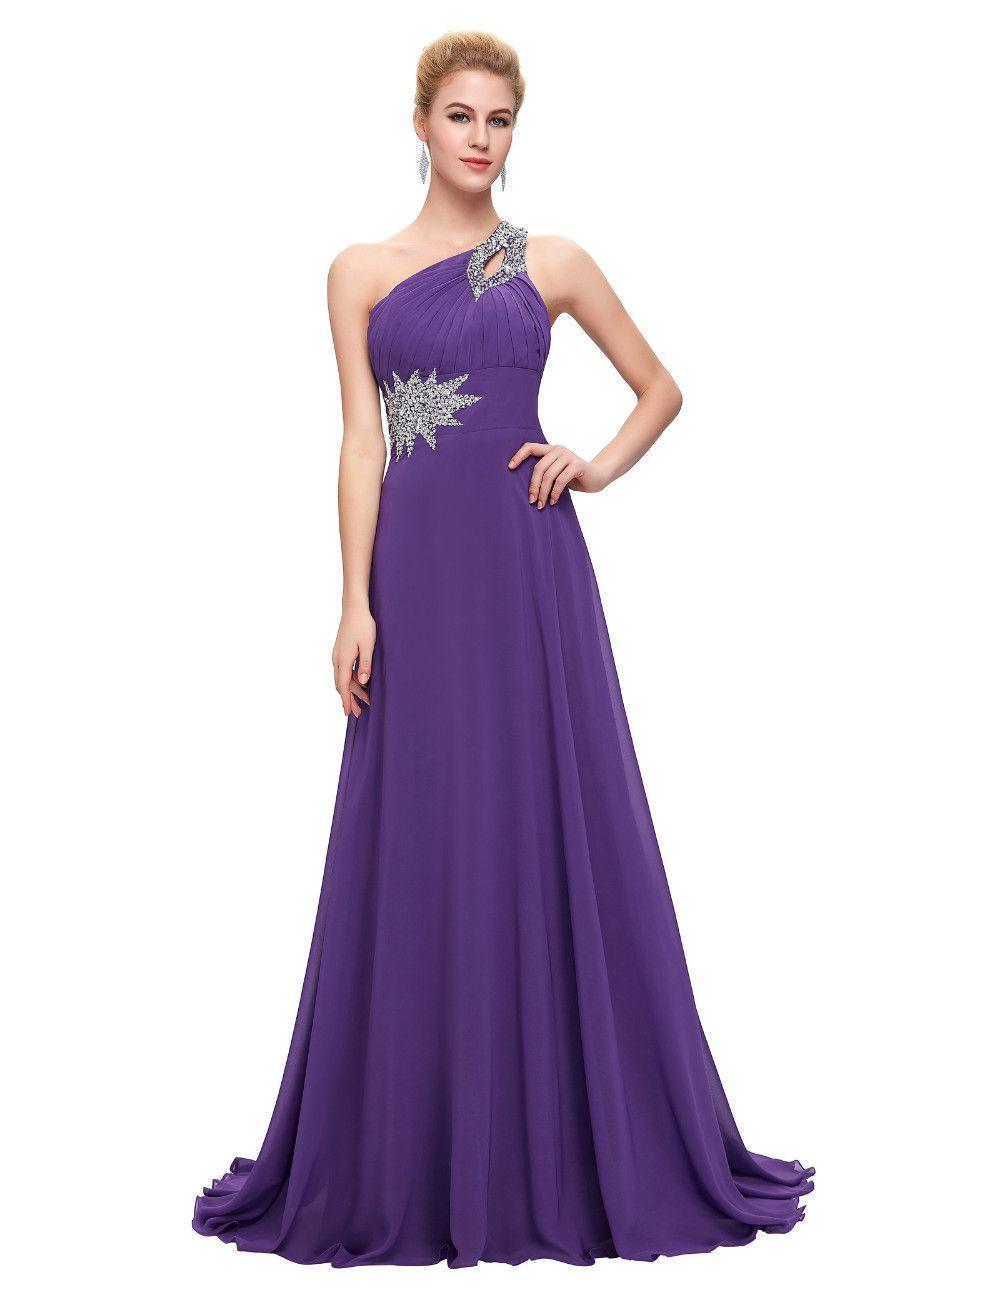 Chiffon Bridesmaid /Prom Dresses One Shoulder Prom Dress at Bling ...